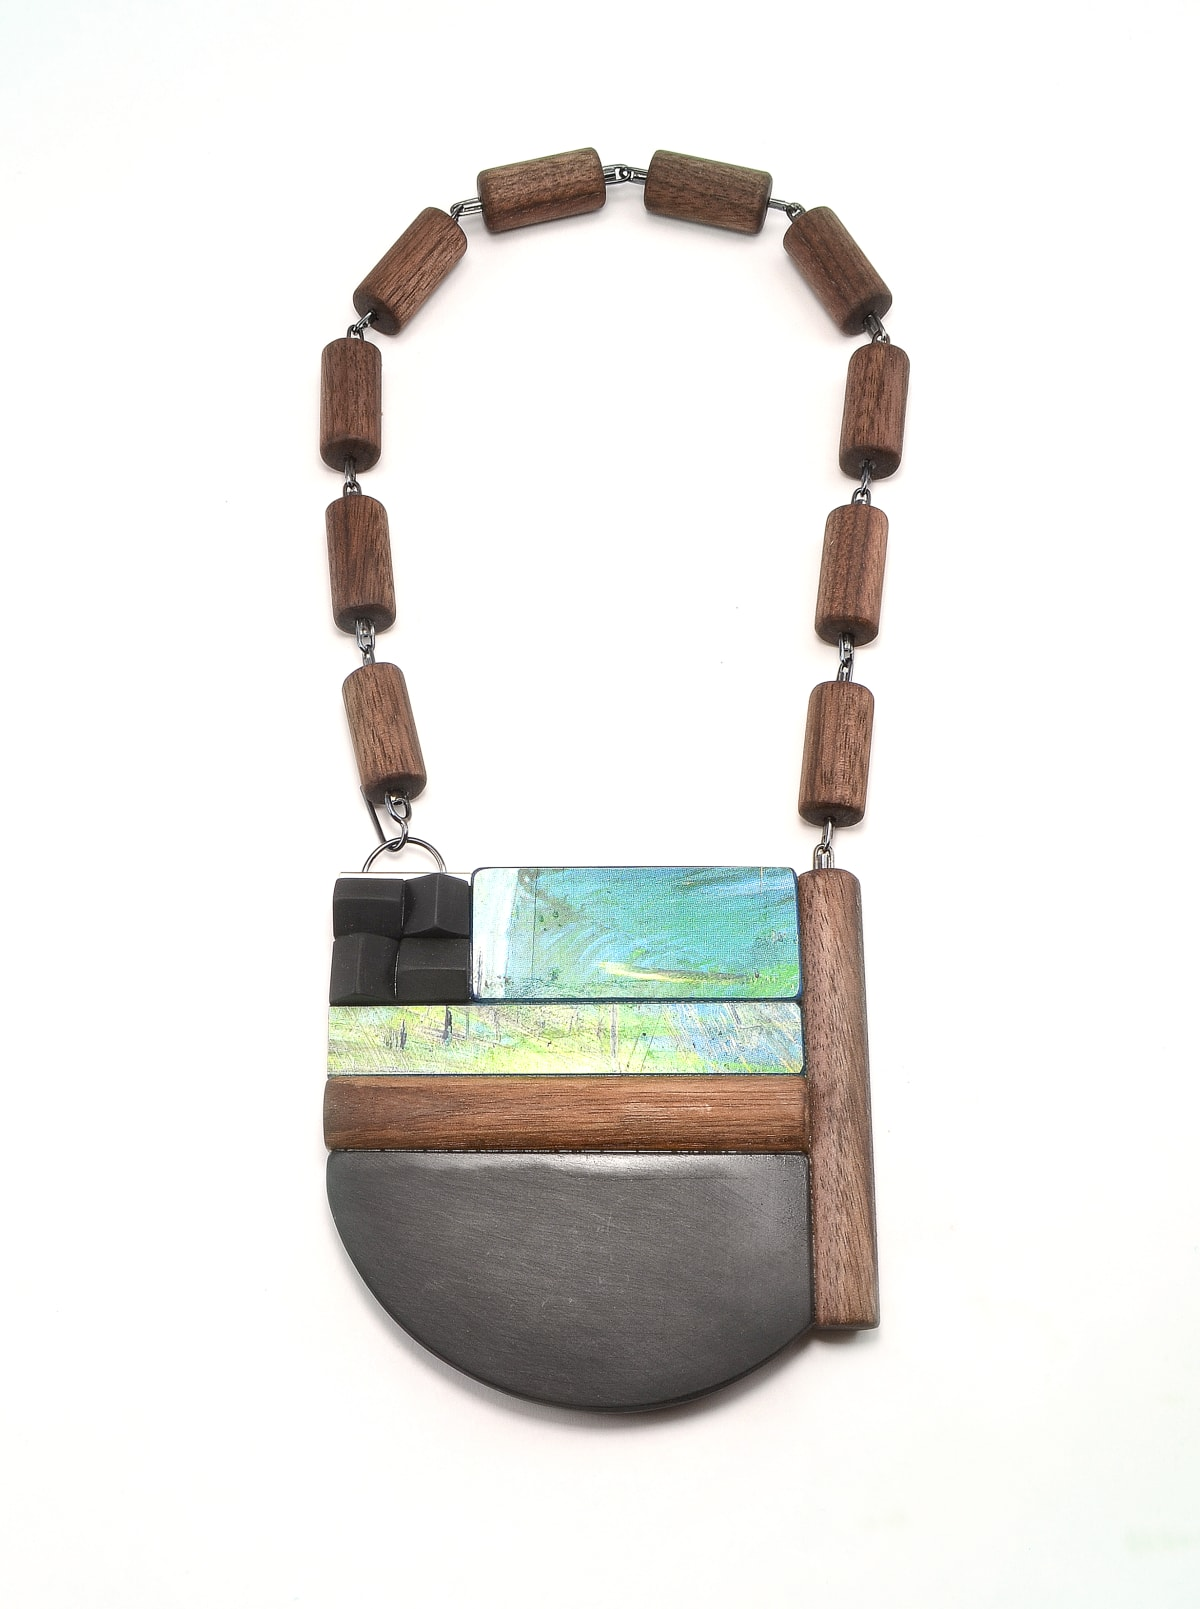 Tara Locklear, Survey Arrange Collection d27 Field Study Necklace, 2018